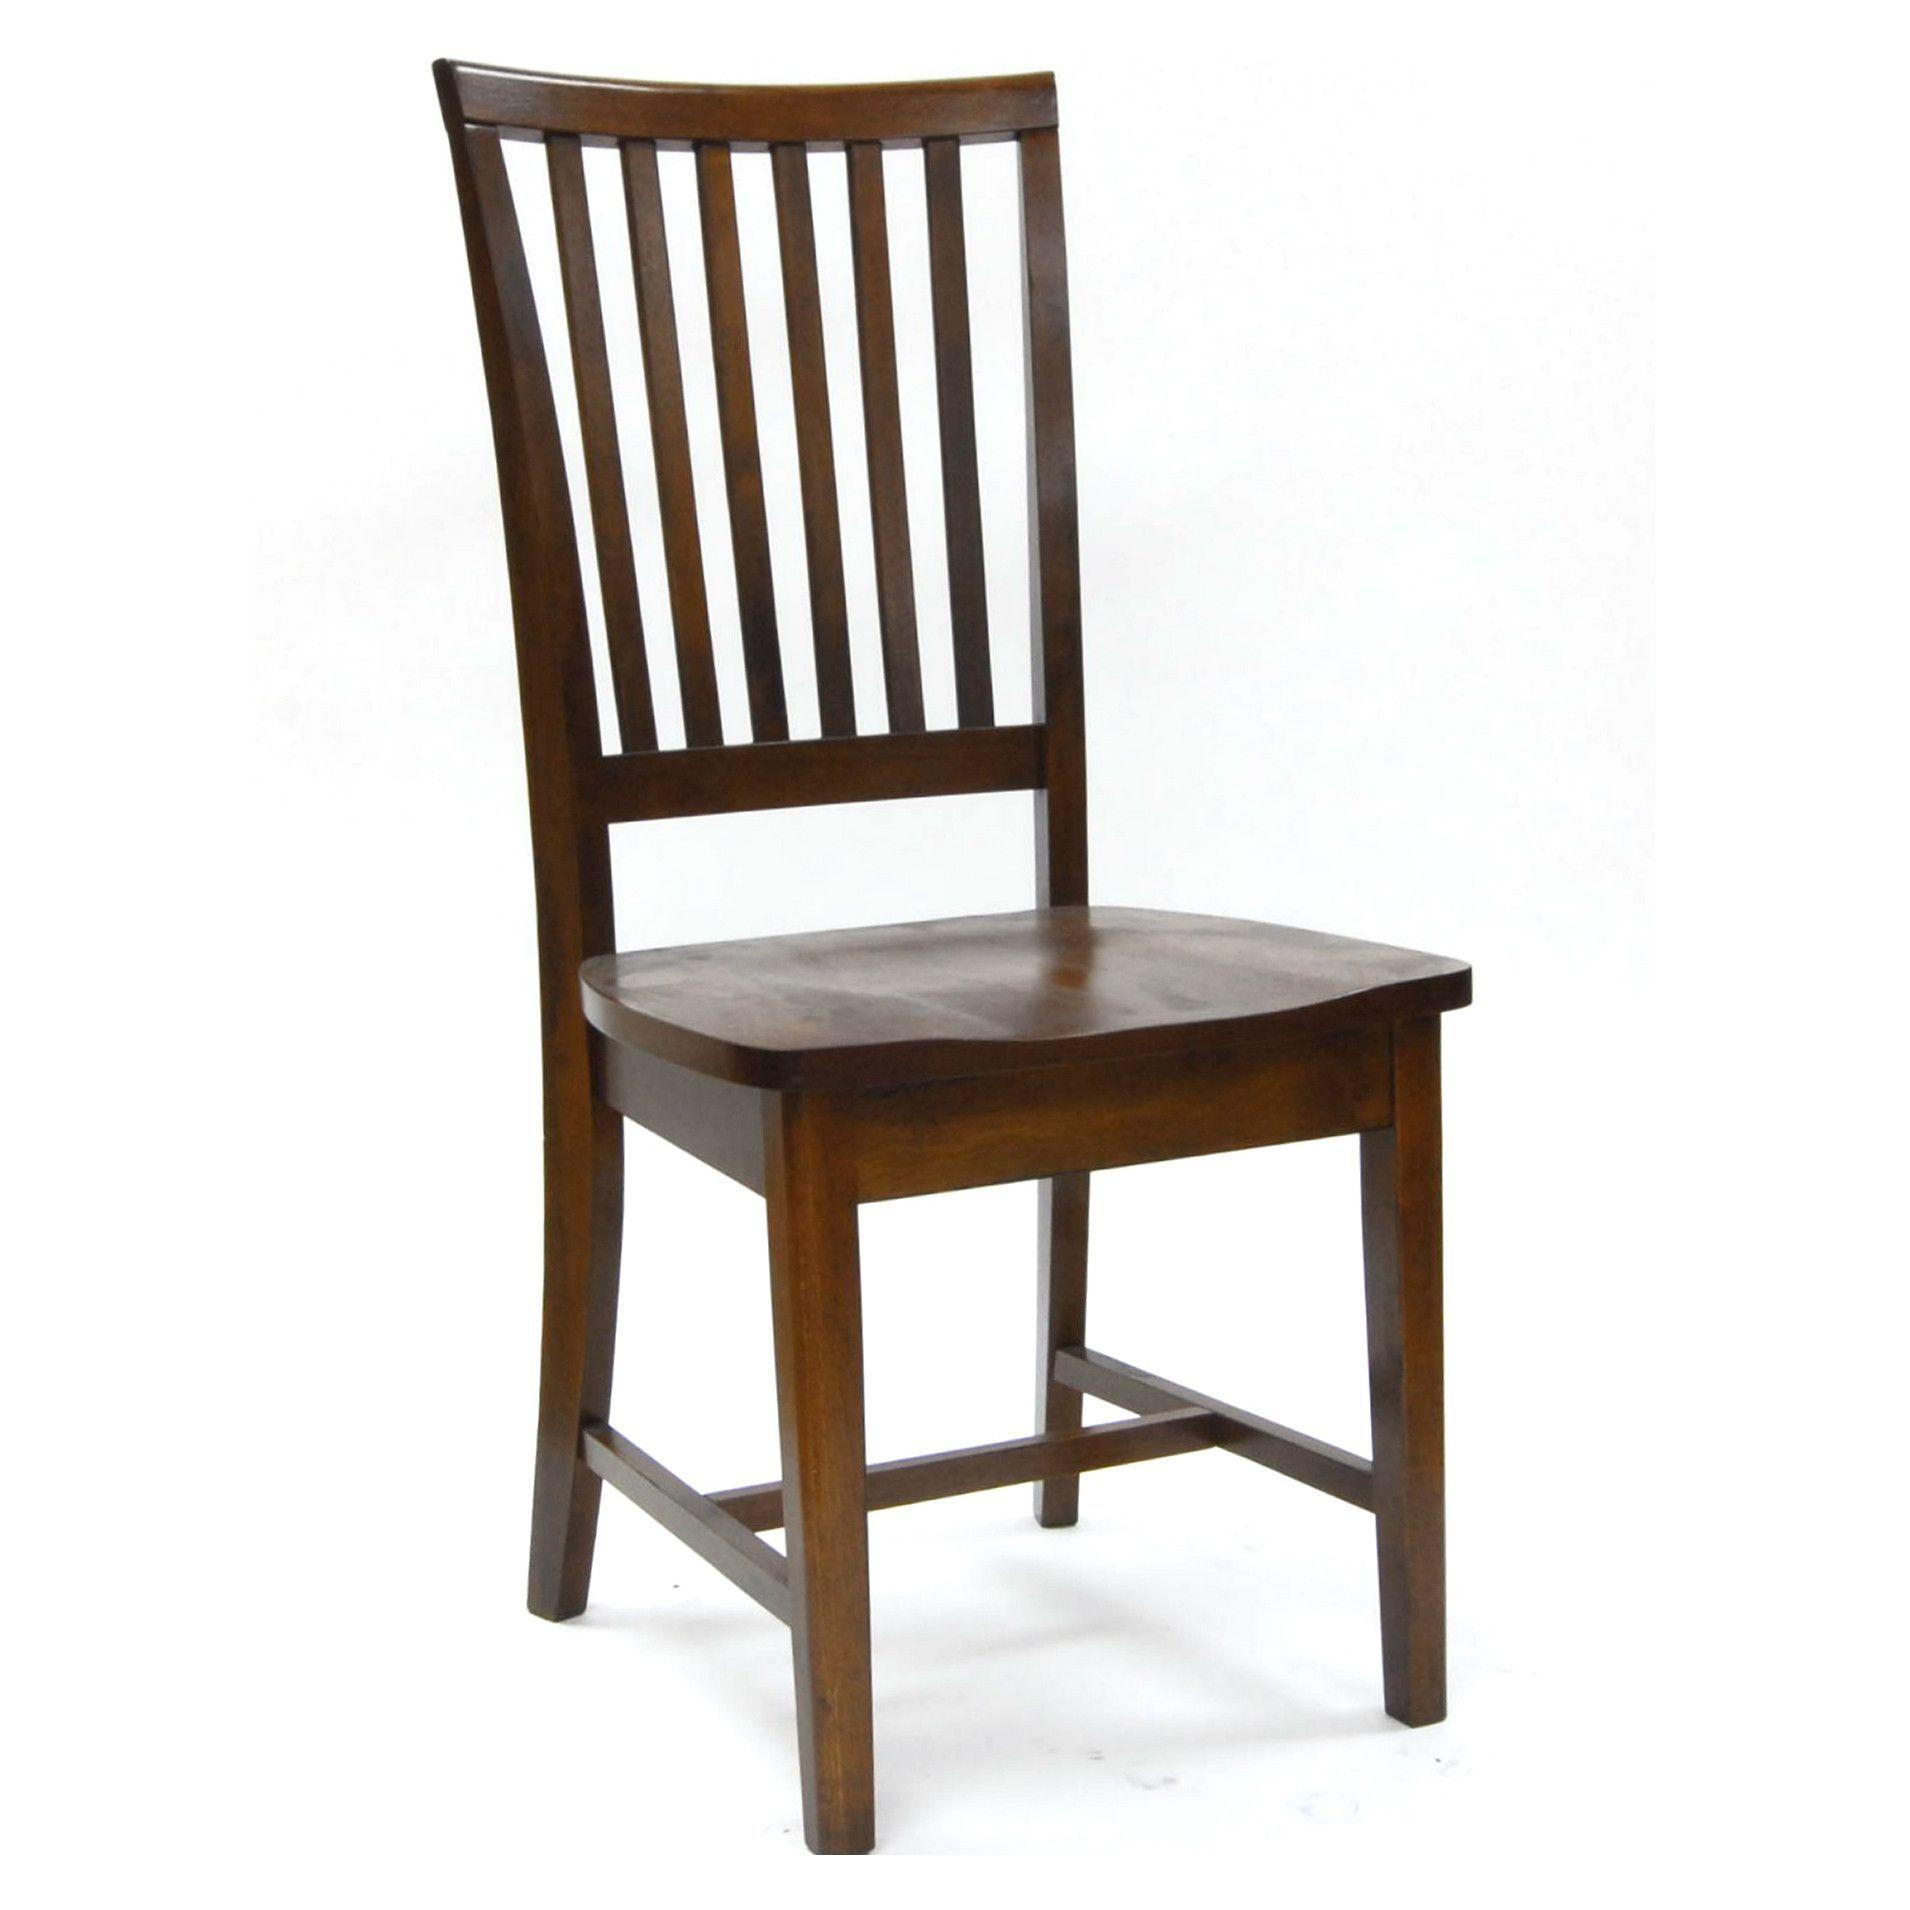 Hudson Chair Chestnut: Hudson Chair CHESTNUT